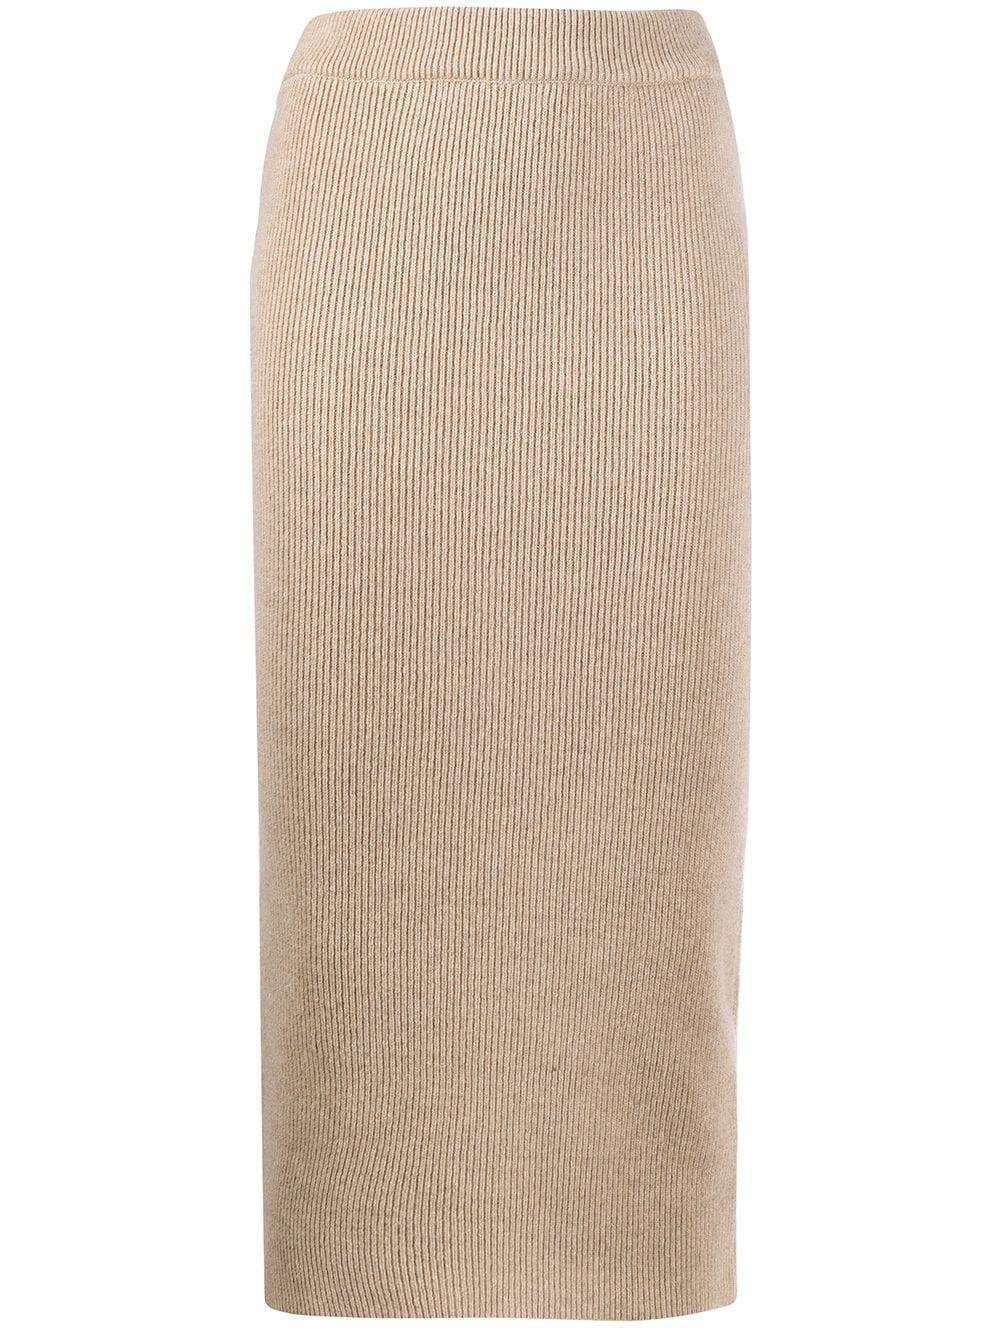 ANINE BING трикотажная юбка-карандаш в рубчик